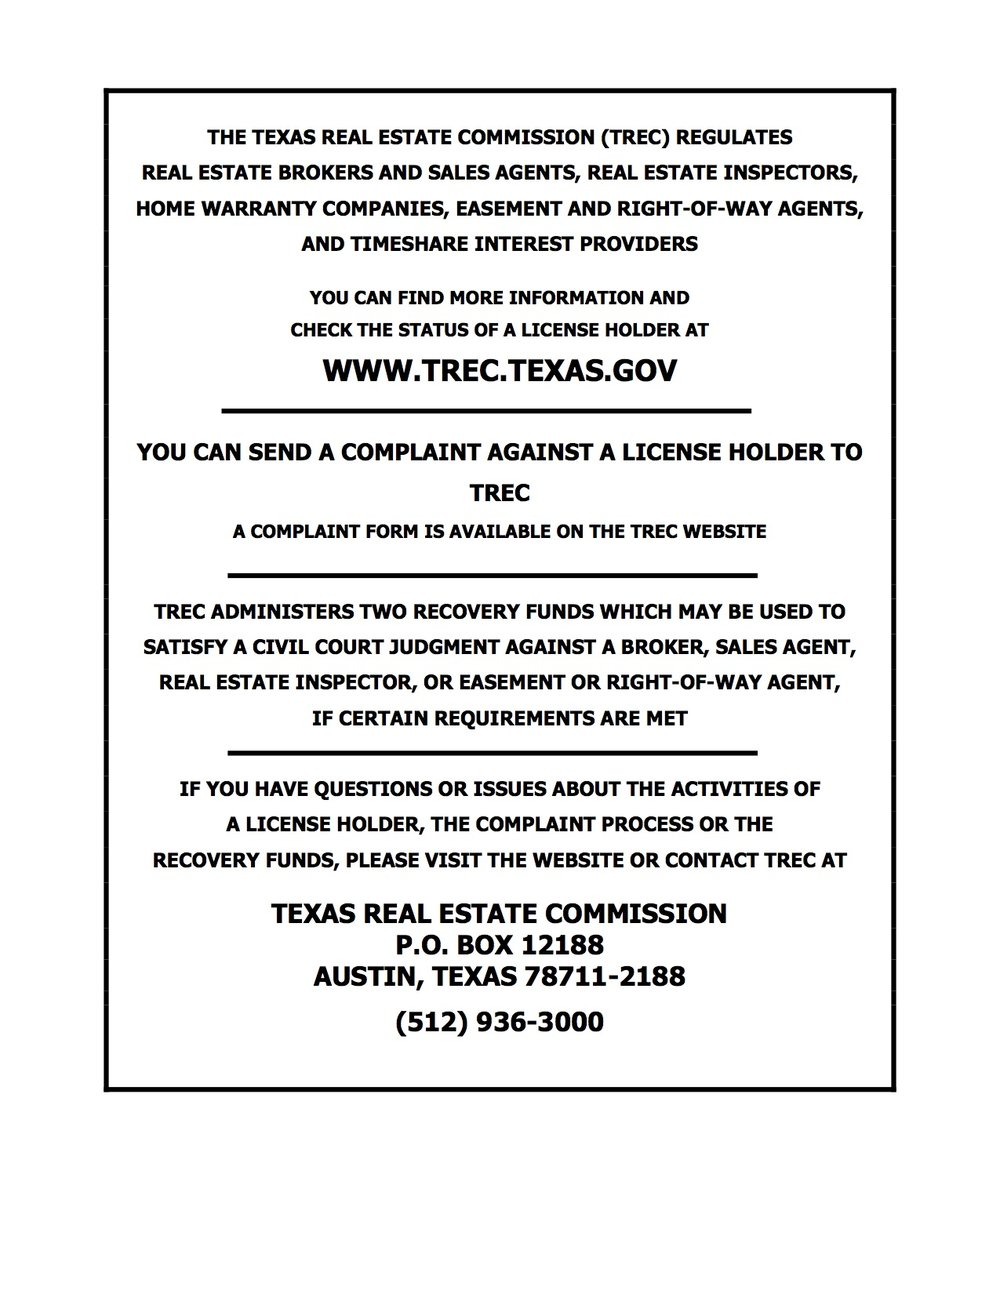 consumer protection notice copy.jpg